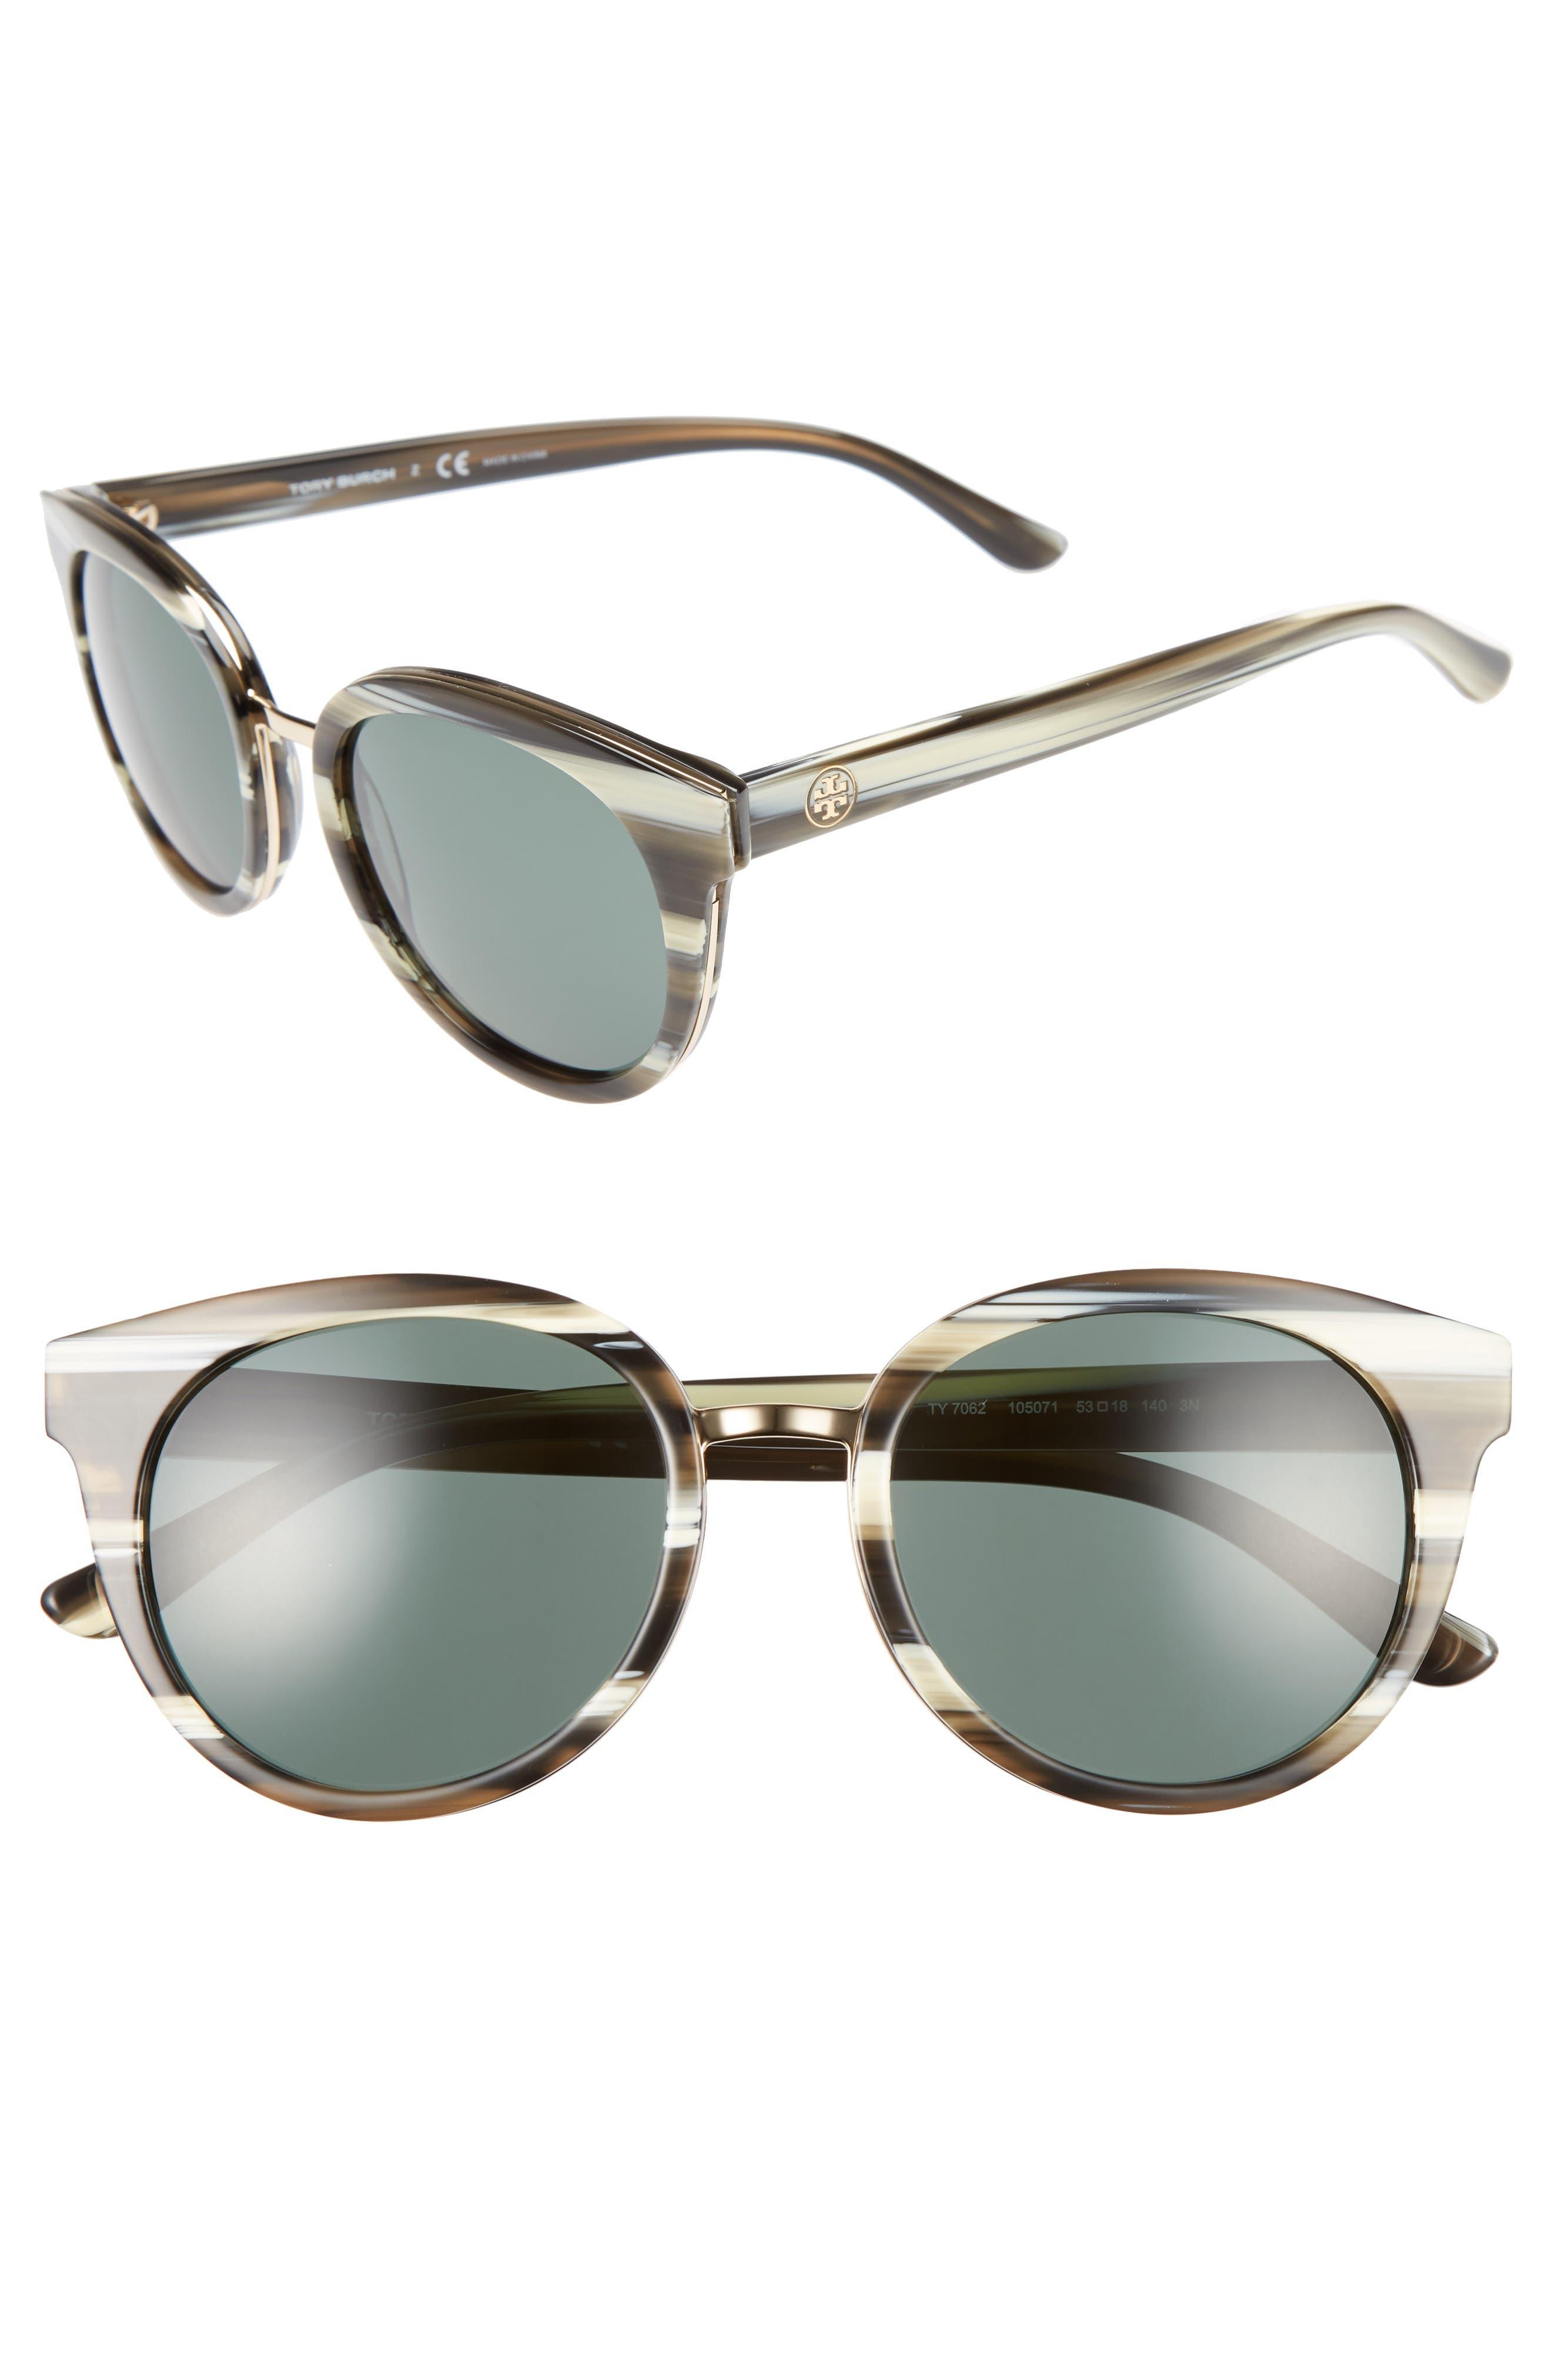 53mm Sunglasses,                             Main thumbnail 1, color,                             300